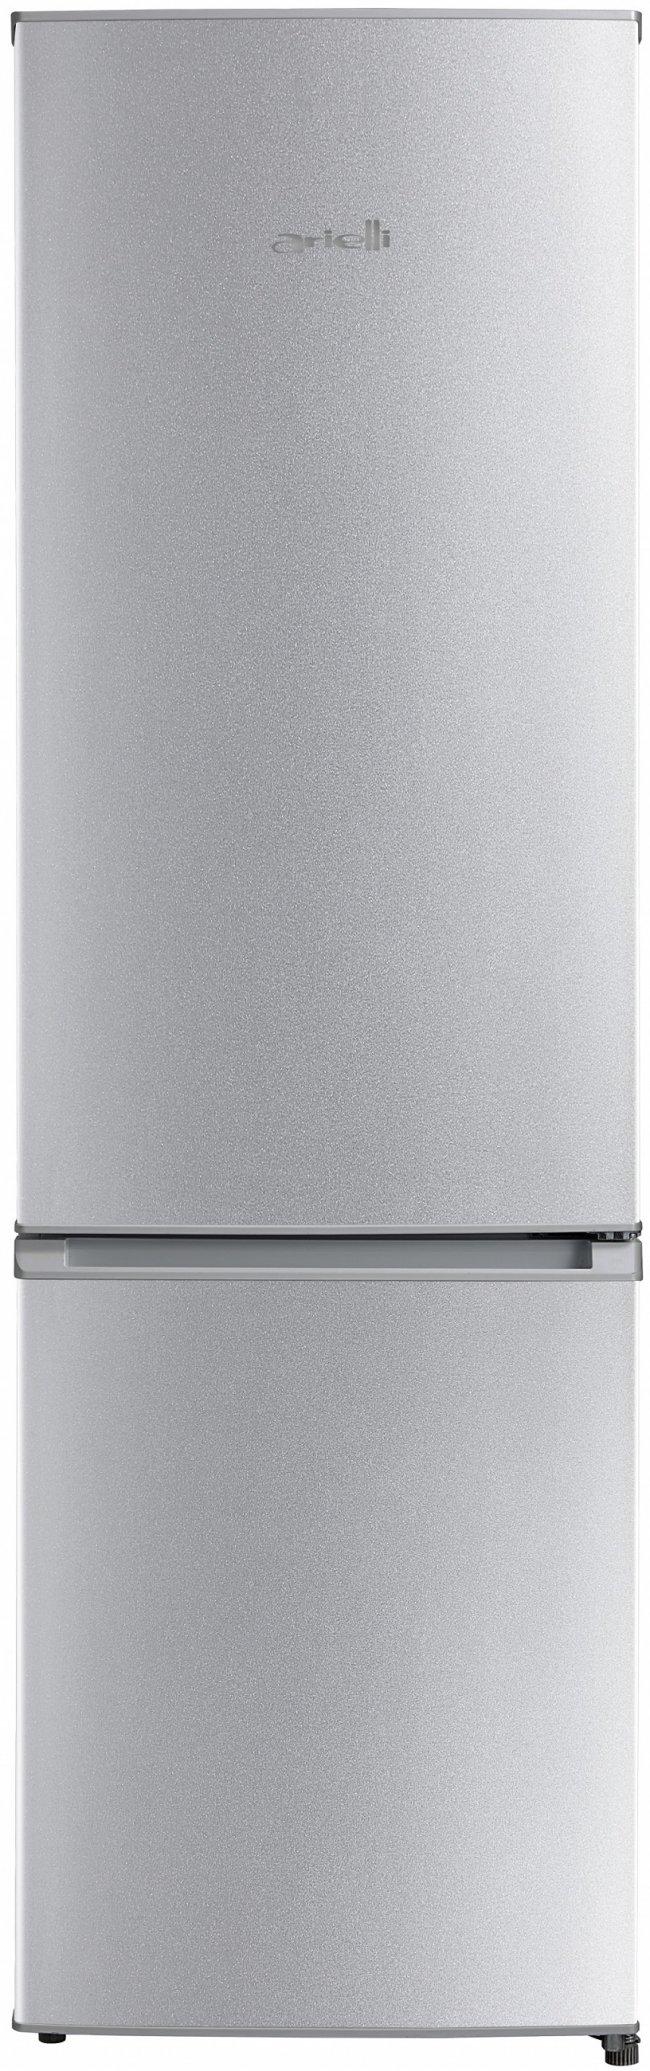 Хладилник Arielli ARD-346RNS